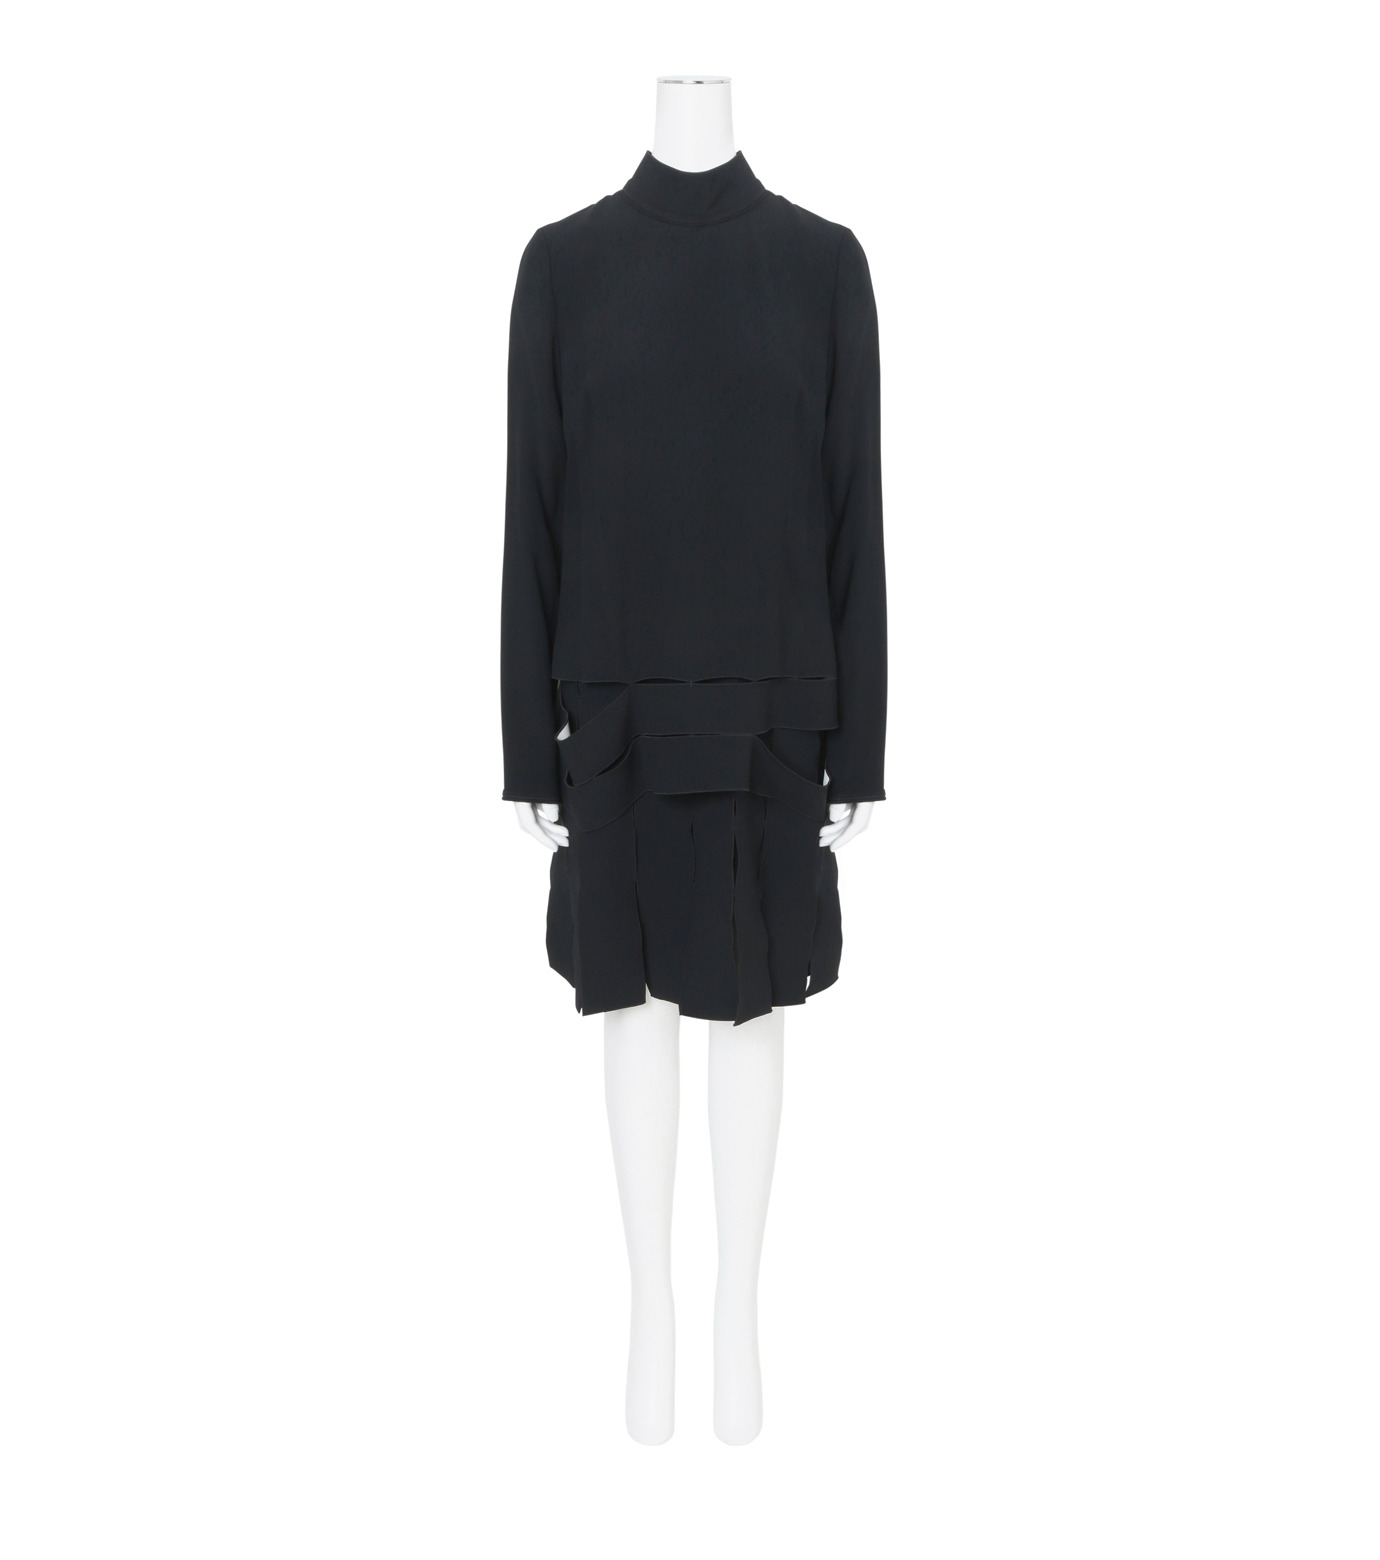 Proenza Schouler(プロエンザ スクーラー)のLS Drop Waist Dress Satin Bonded-BLACK(ワンピース/one piece)-R164342-13 拡大詳細画像1